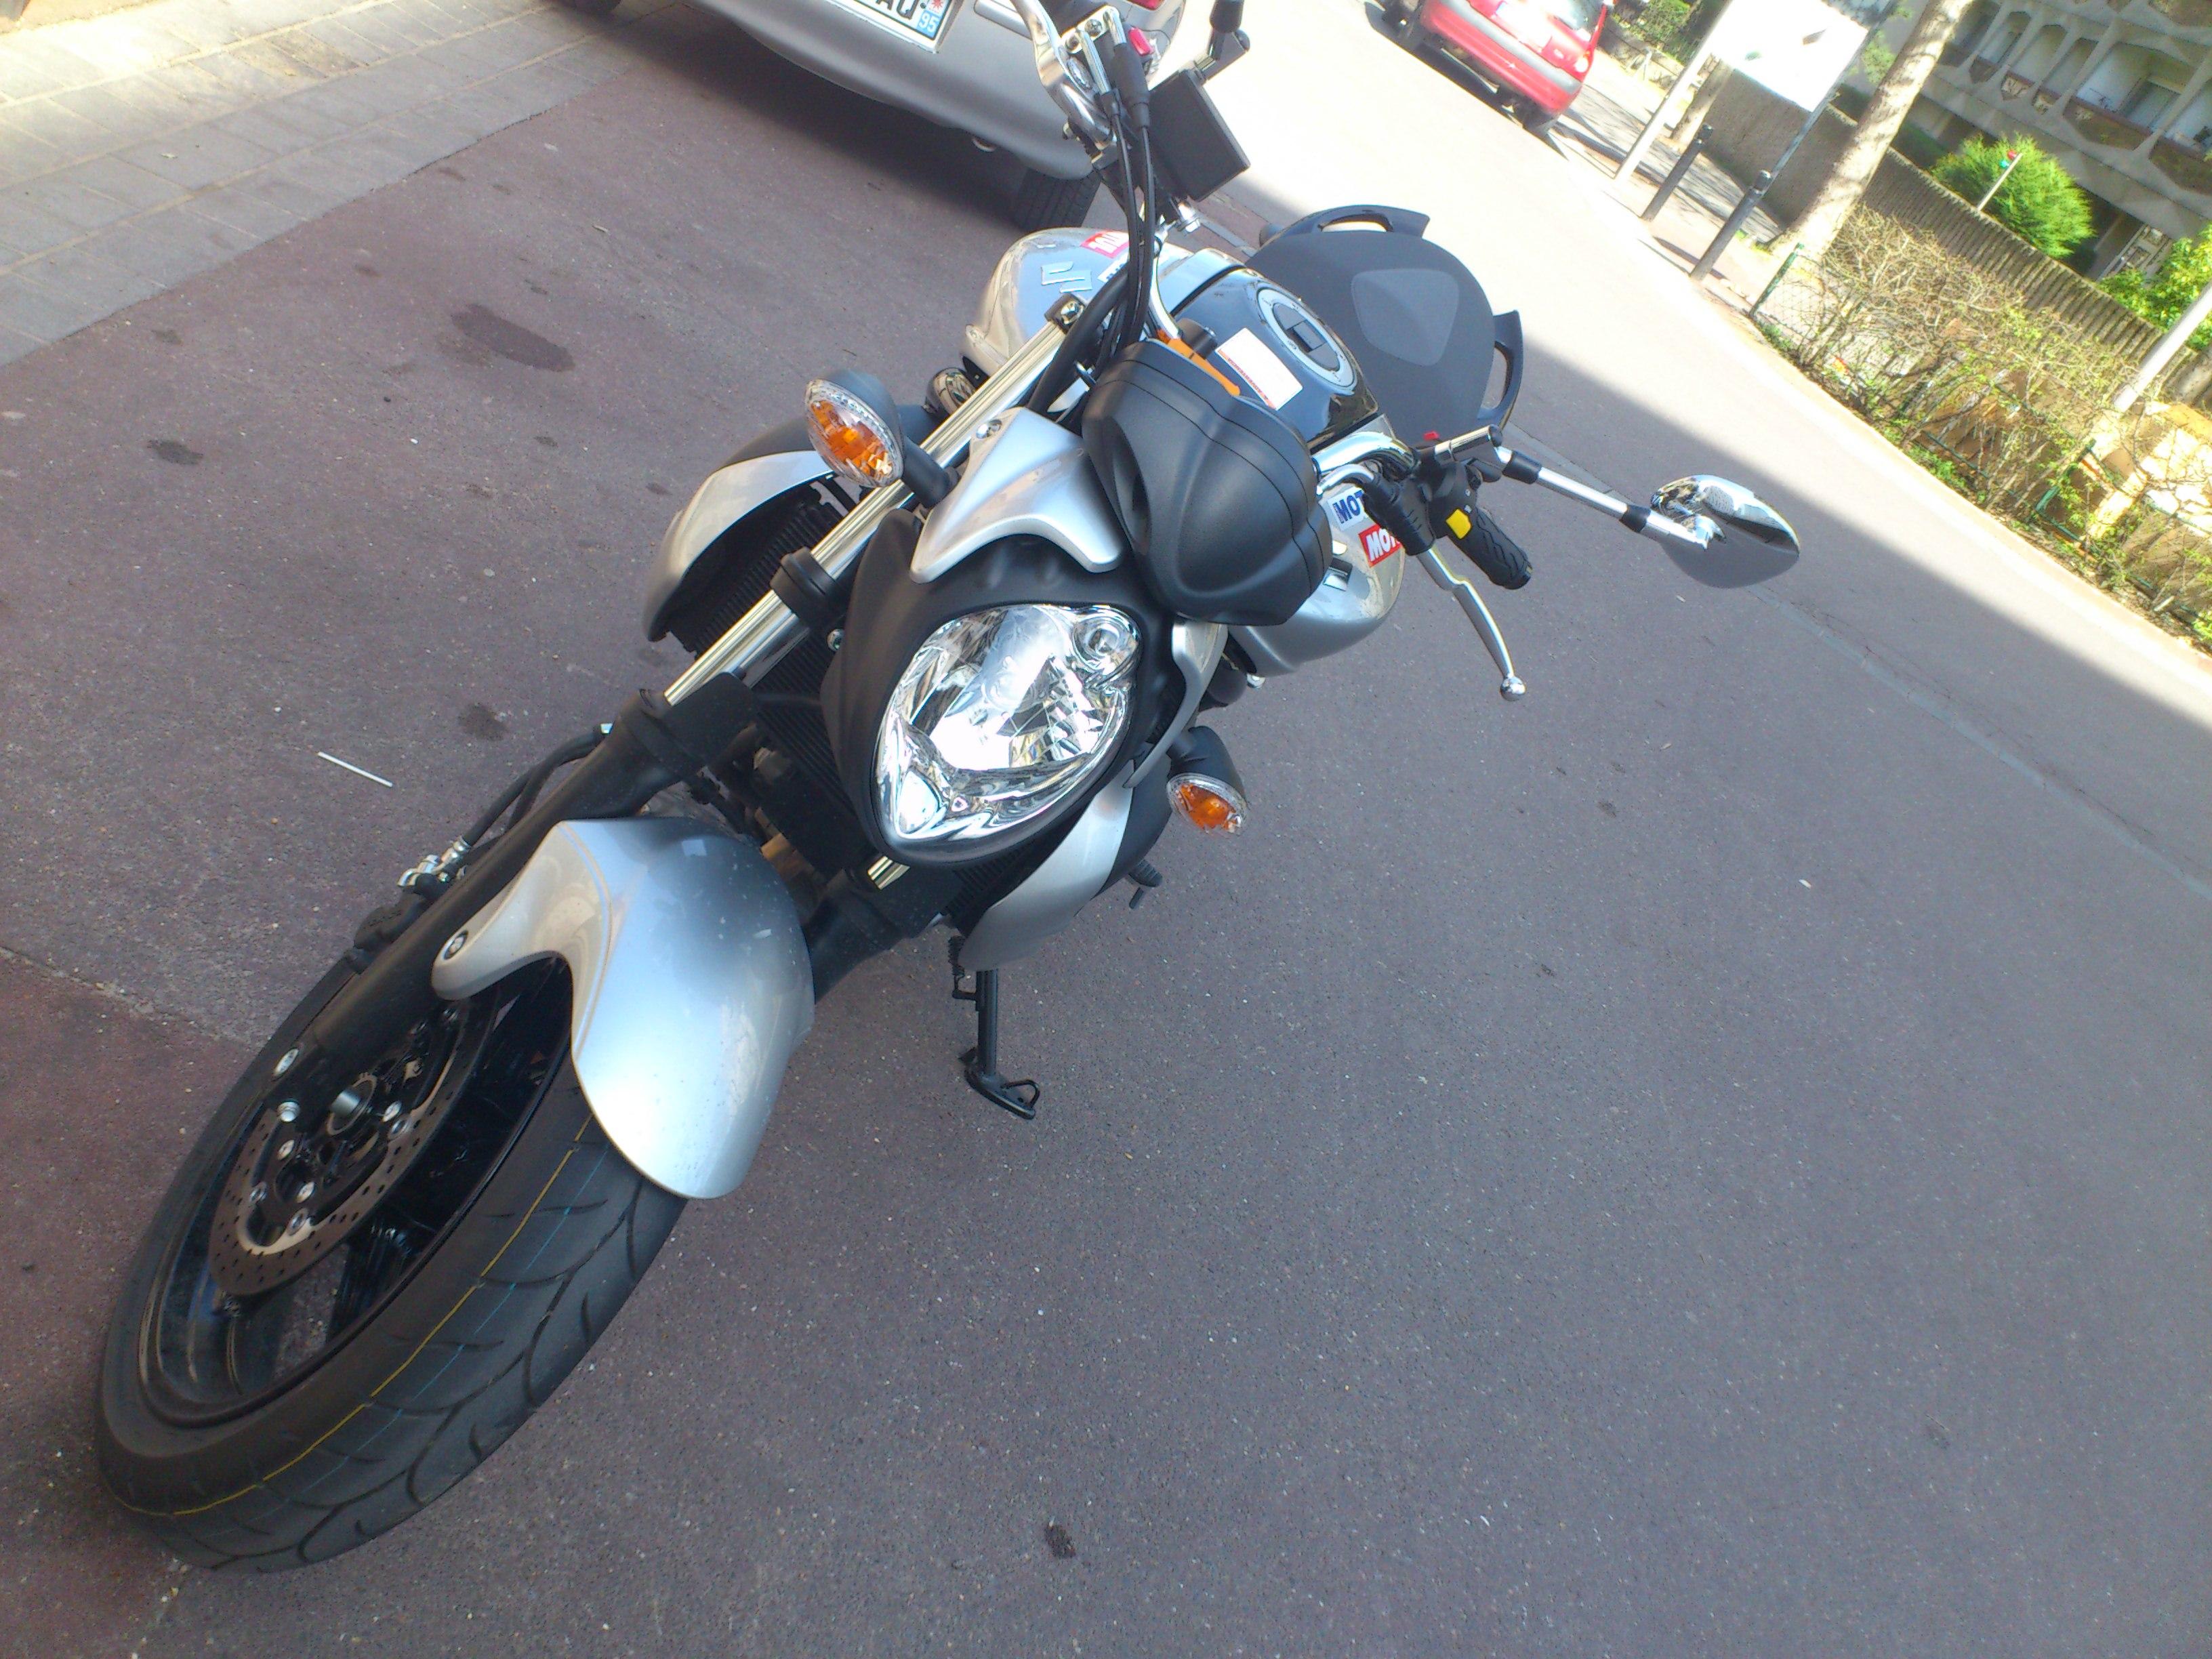 forums autres motos essai suzuki sfv 650 gladius la brutale made in japan motos bandit. Black Bedroom Furniture Sets. Home Design Ideas